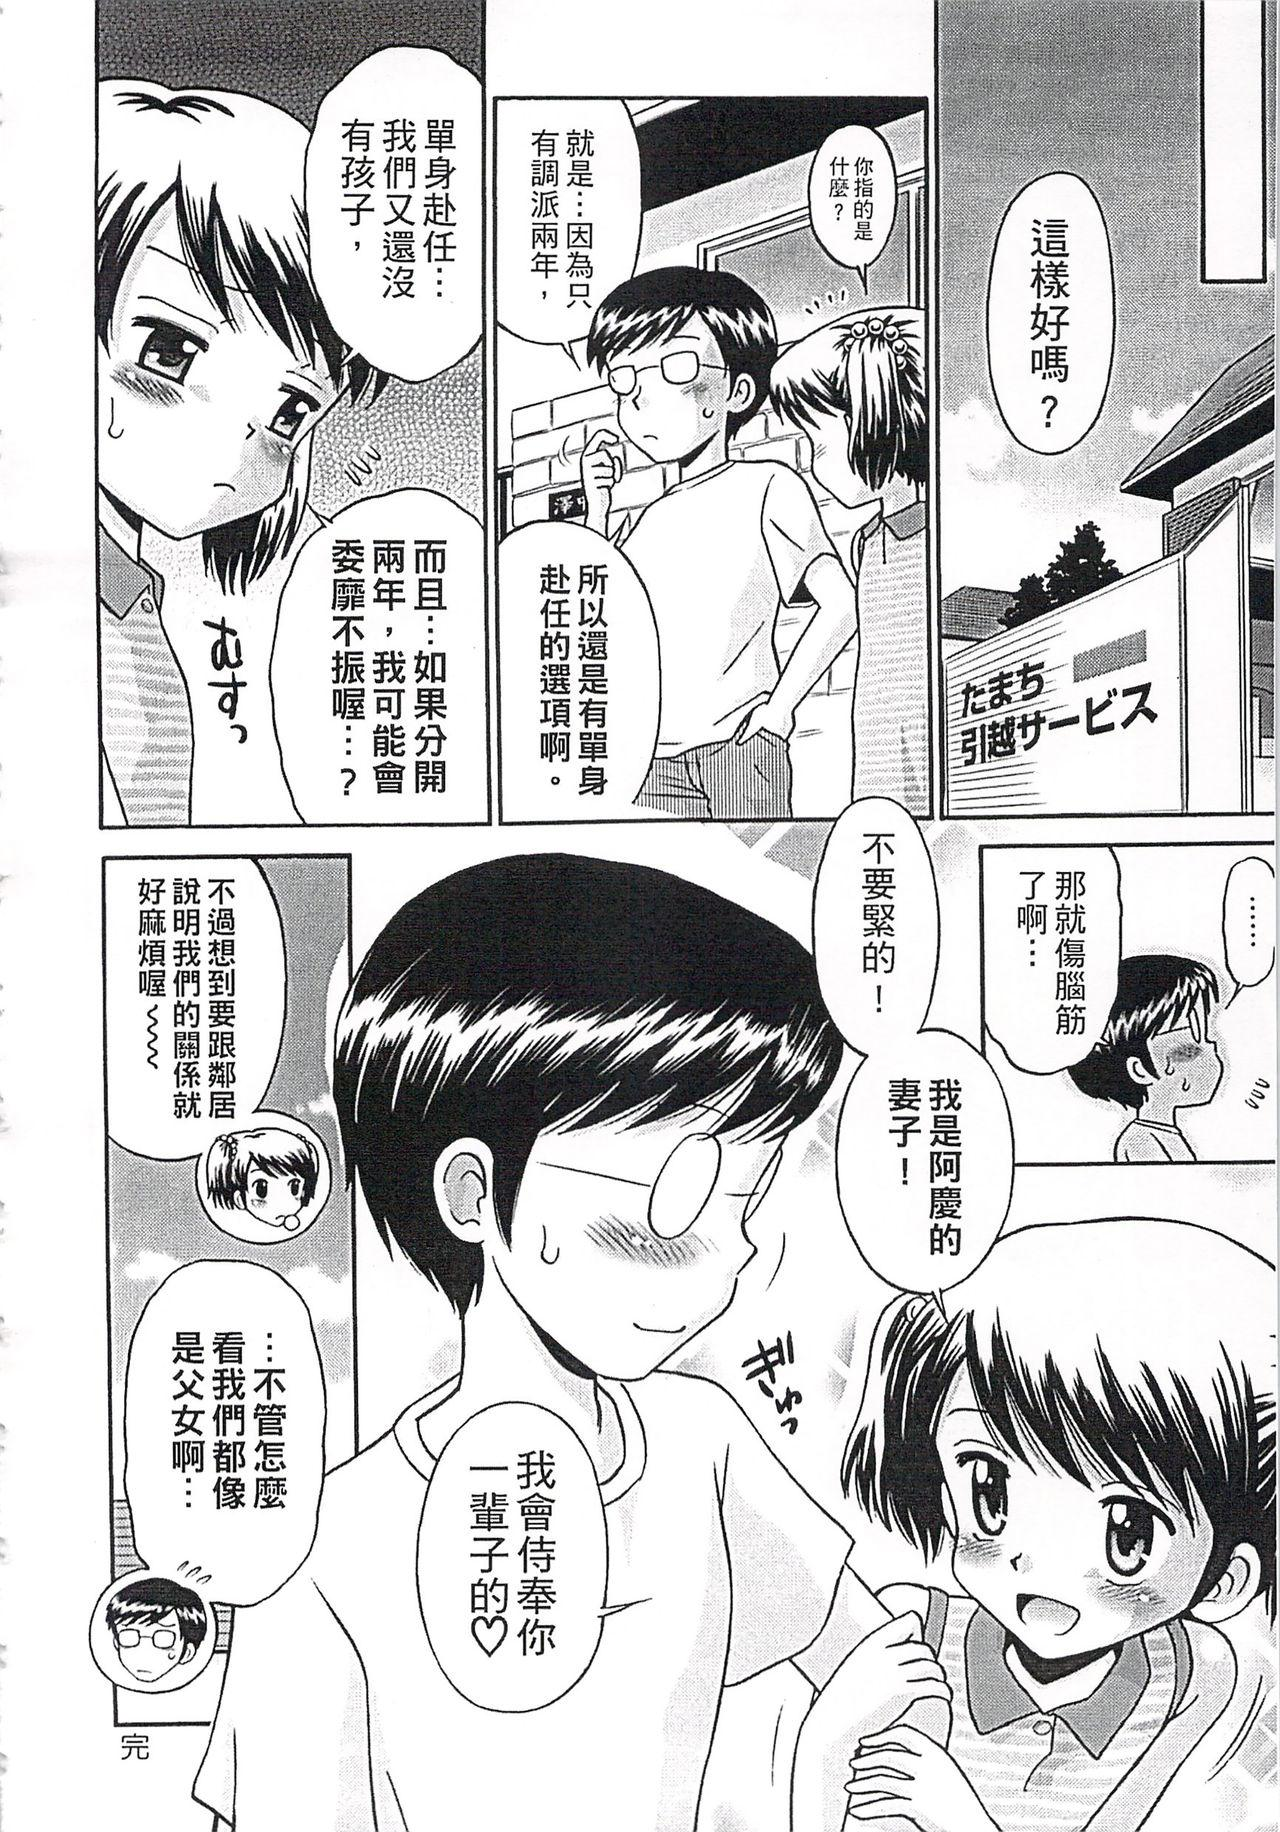 Kore demo Otona Desu Kedo!? Mrs.LOLITA Kanzenban   人家是大人啦! ~Mrs.LOLITA完全版 115